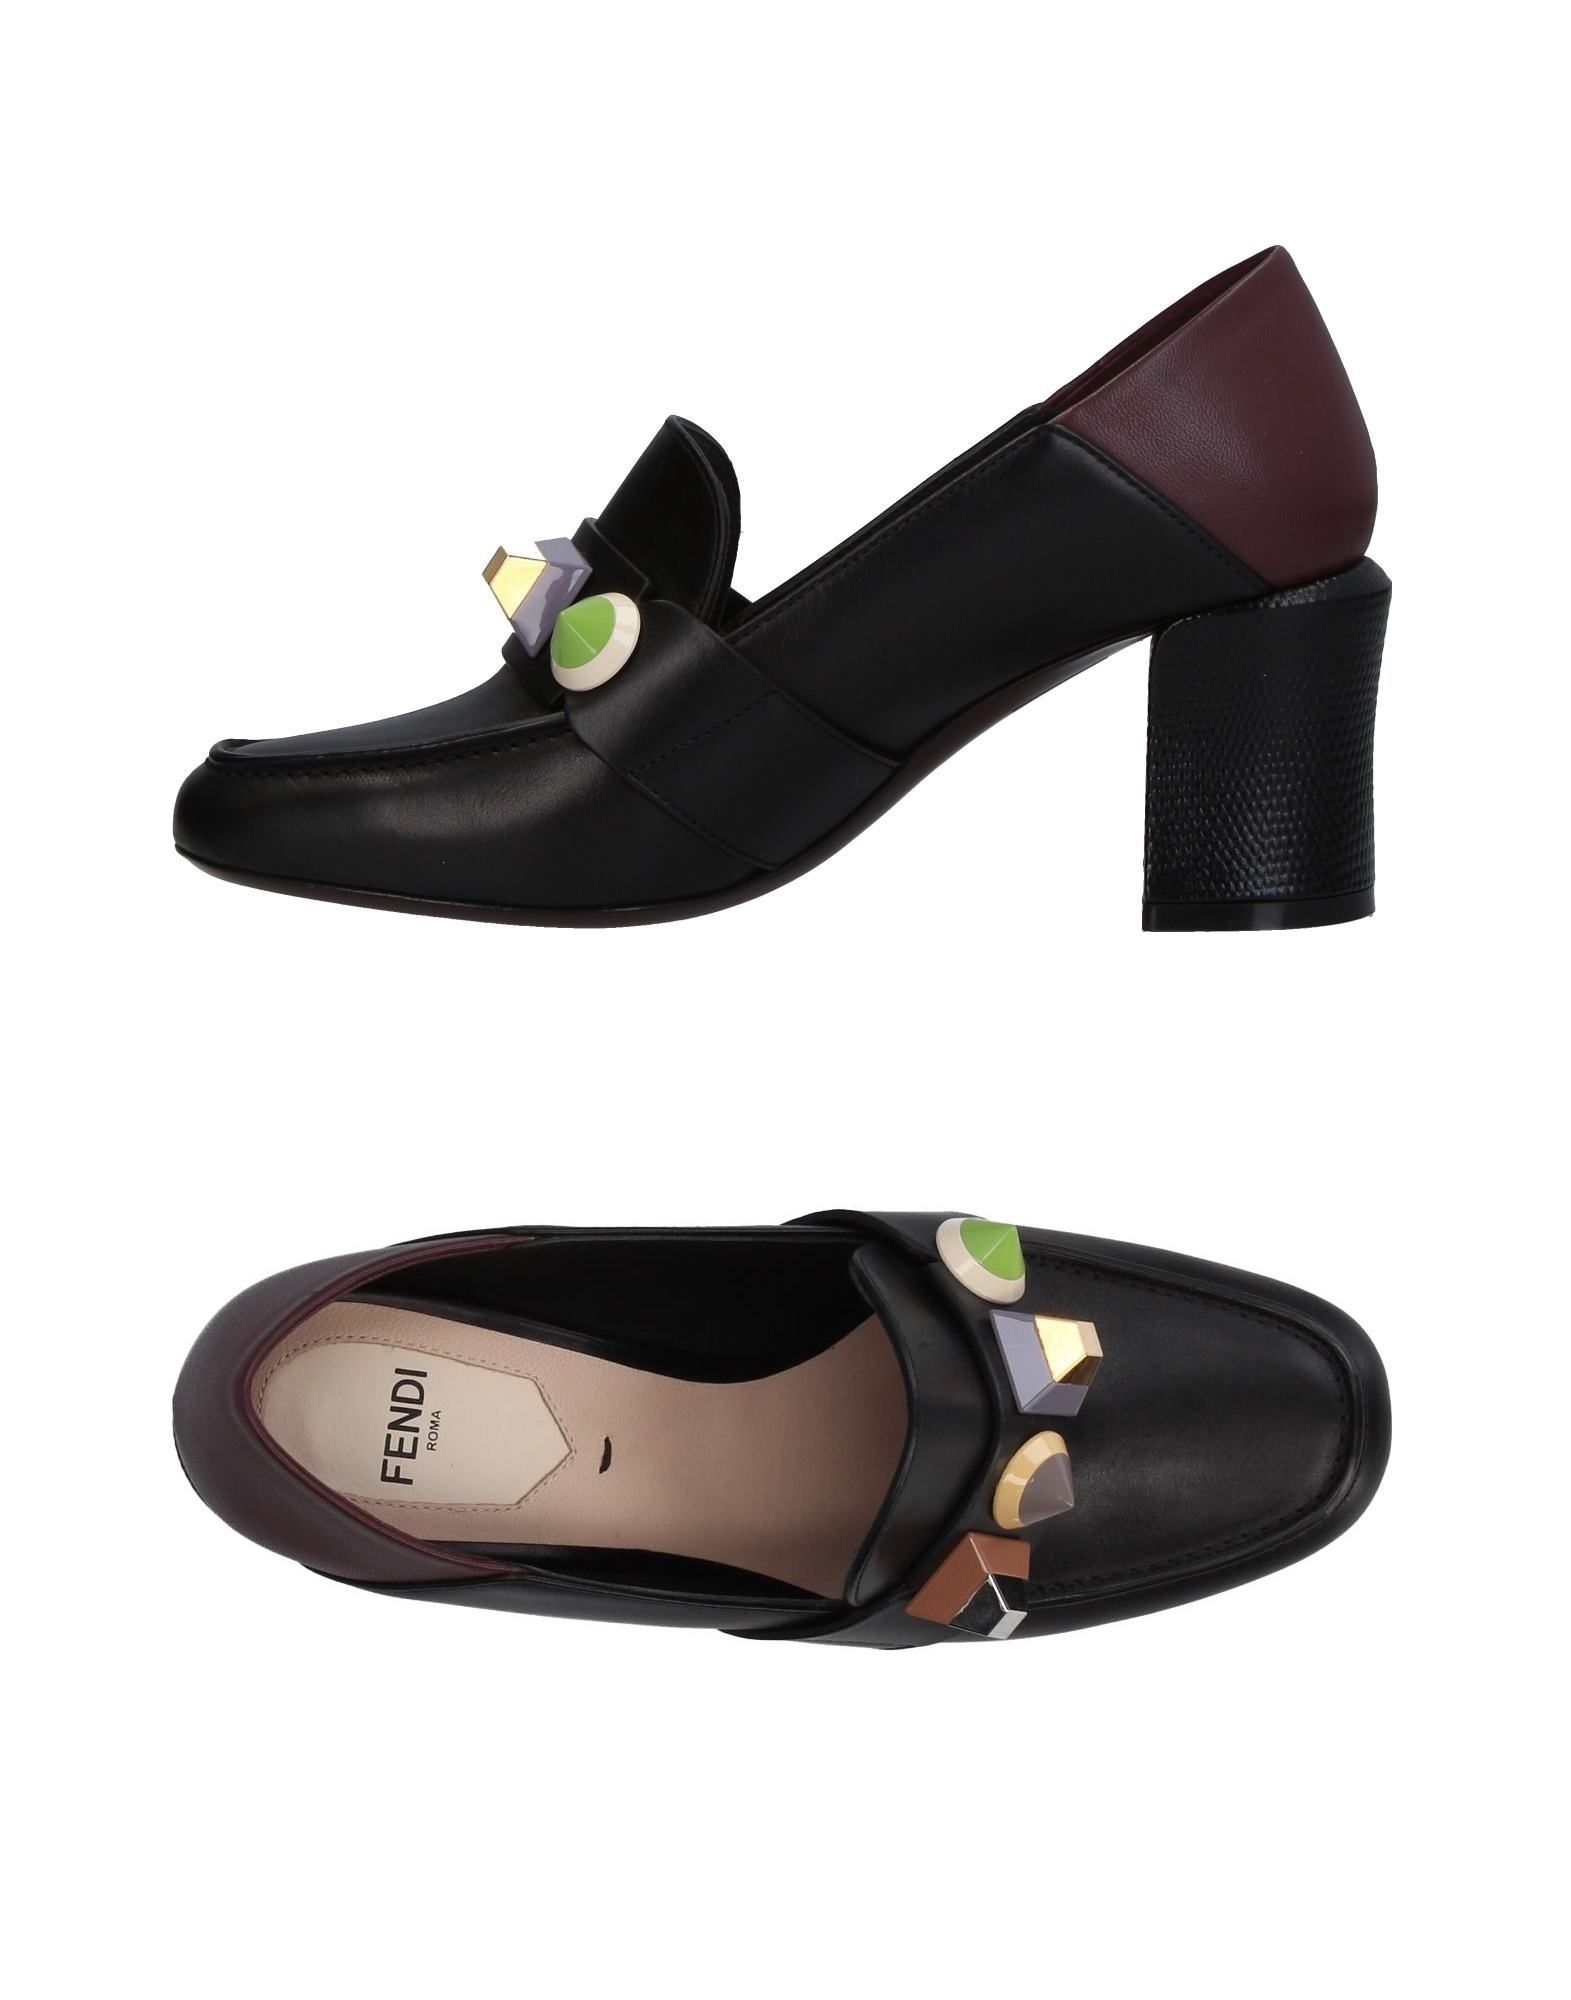 2ac1b7c702a Fendi loafers in black modesens JPG 1571x2000 Fendi loafers